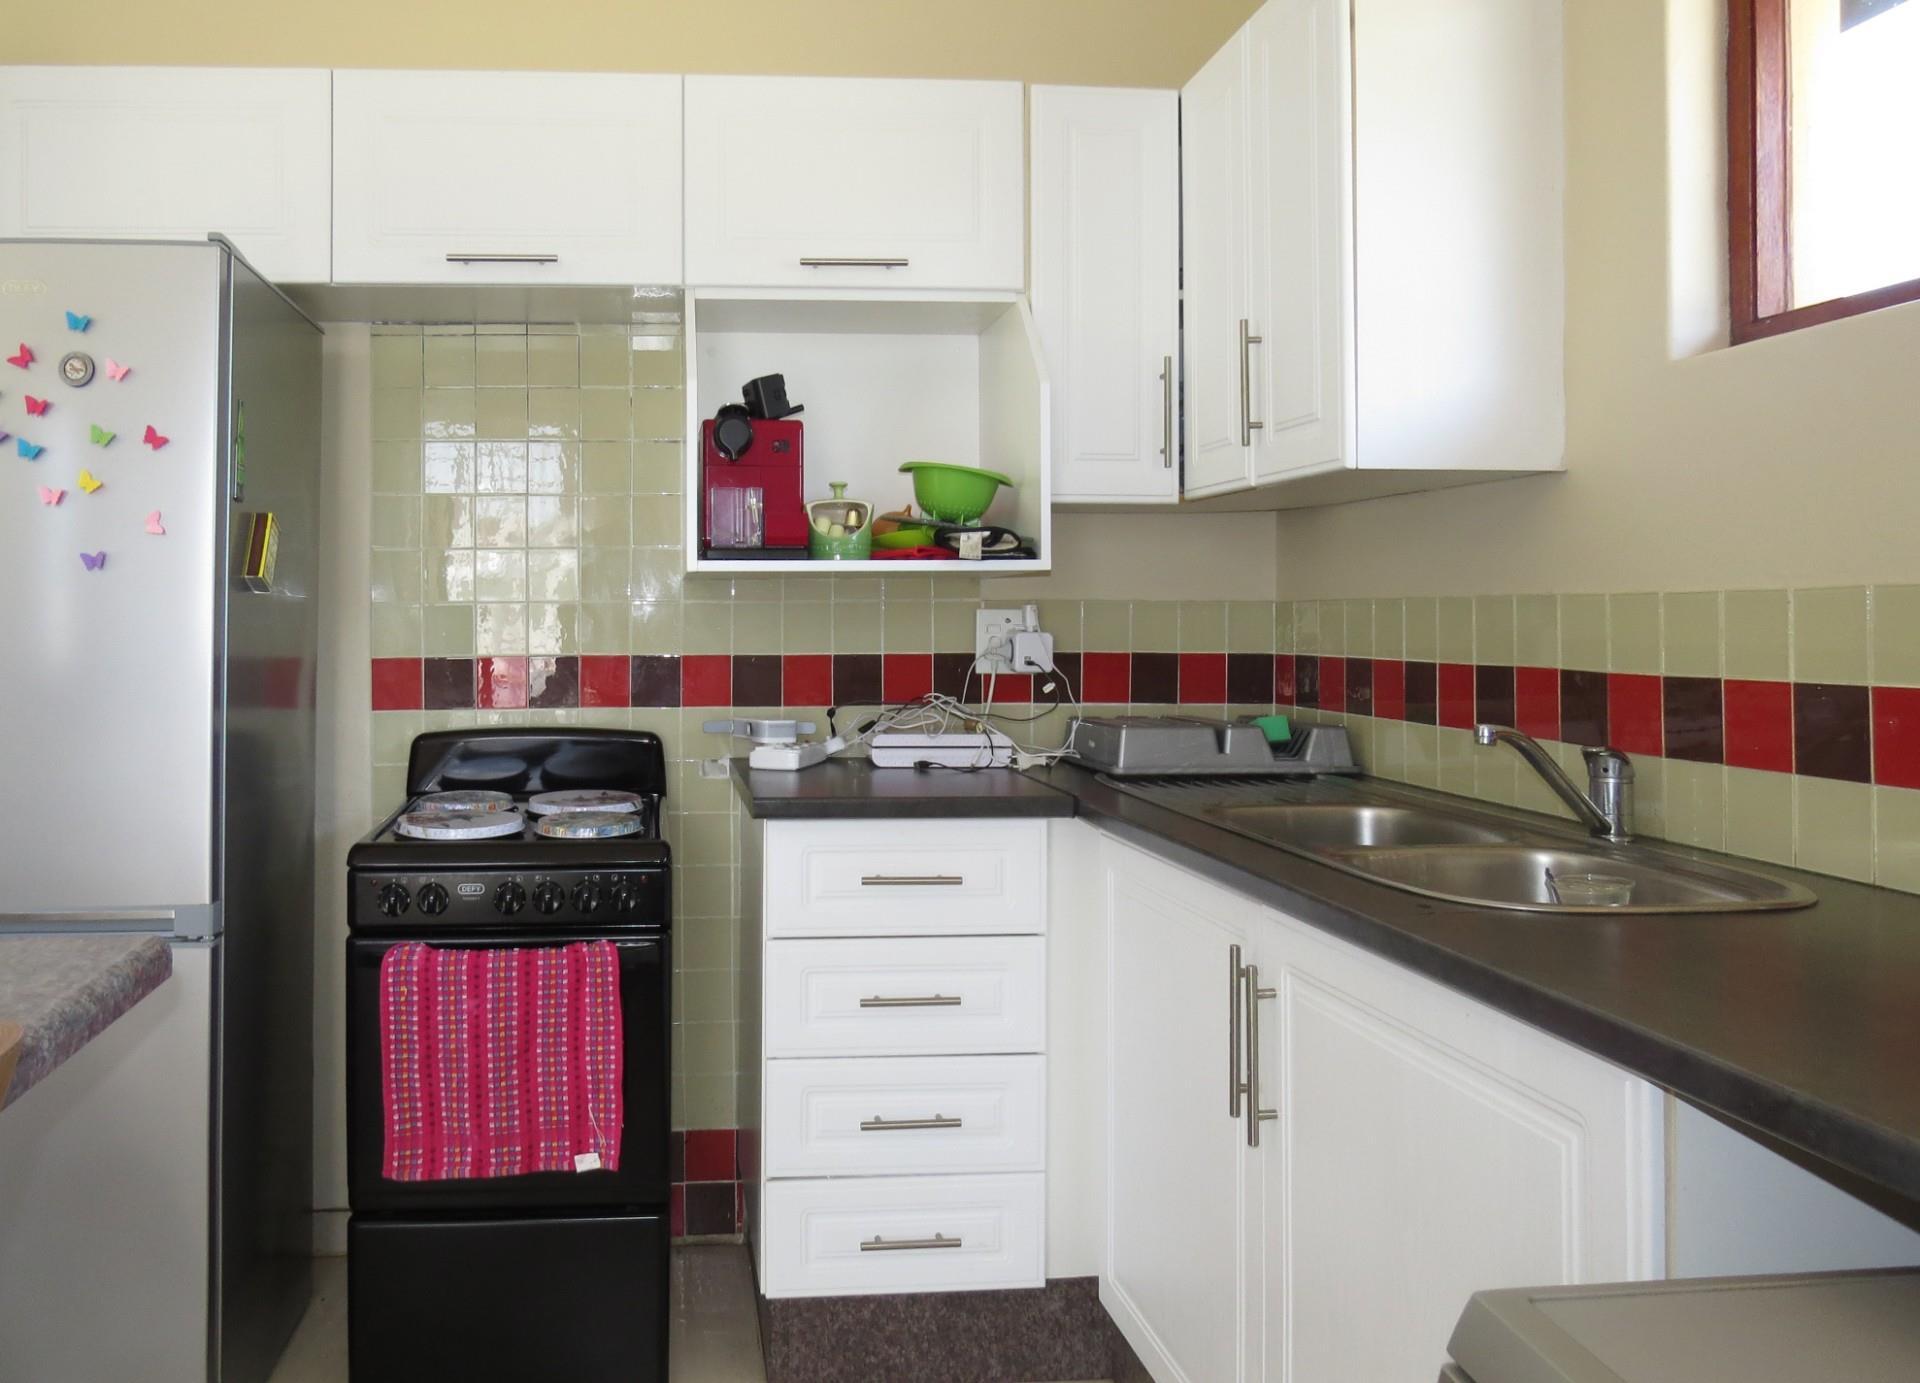 3 Bedroom House For Sale in Kensington B